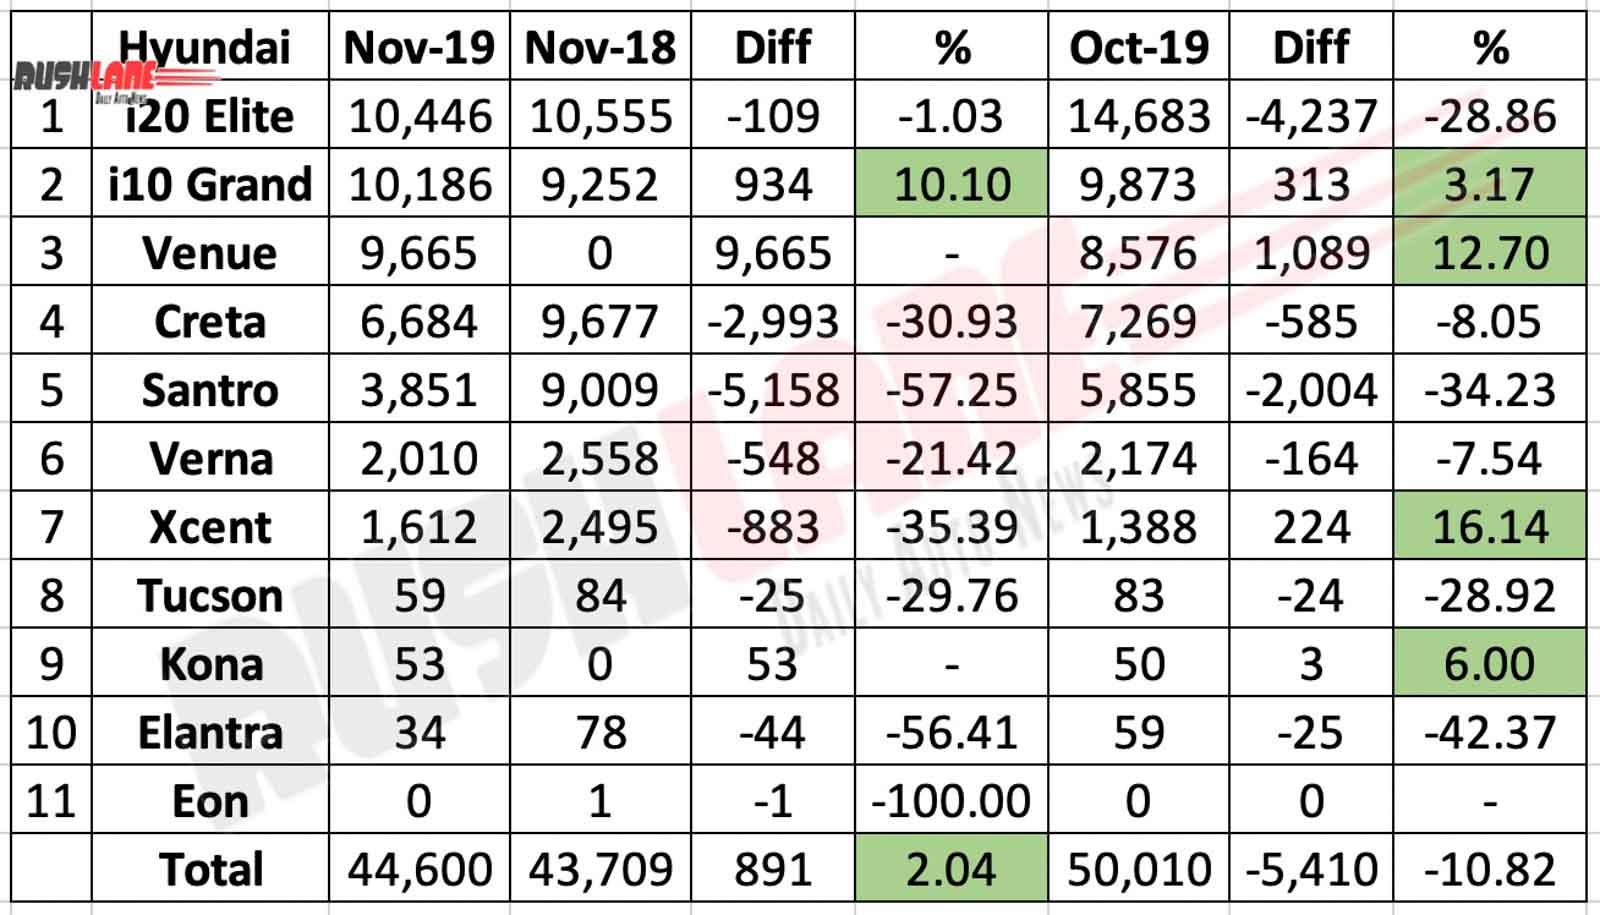 Hyundai sales break up Nov 2019